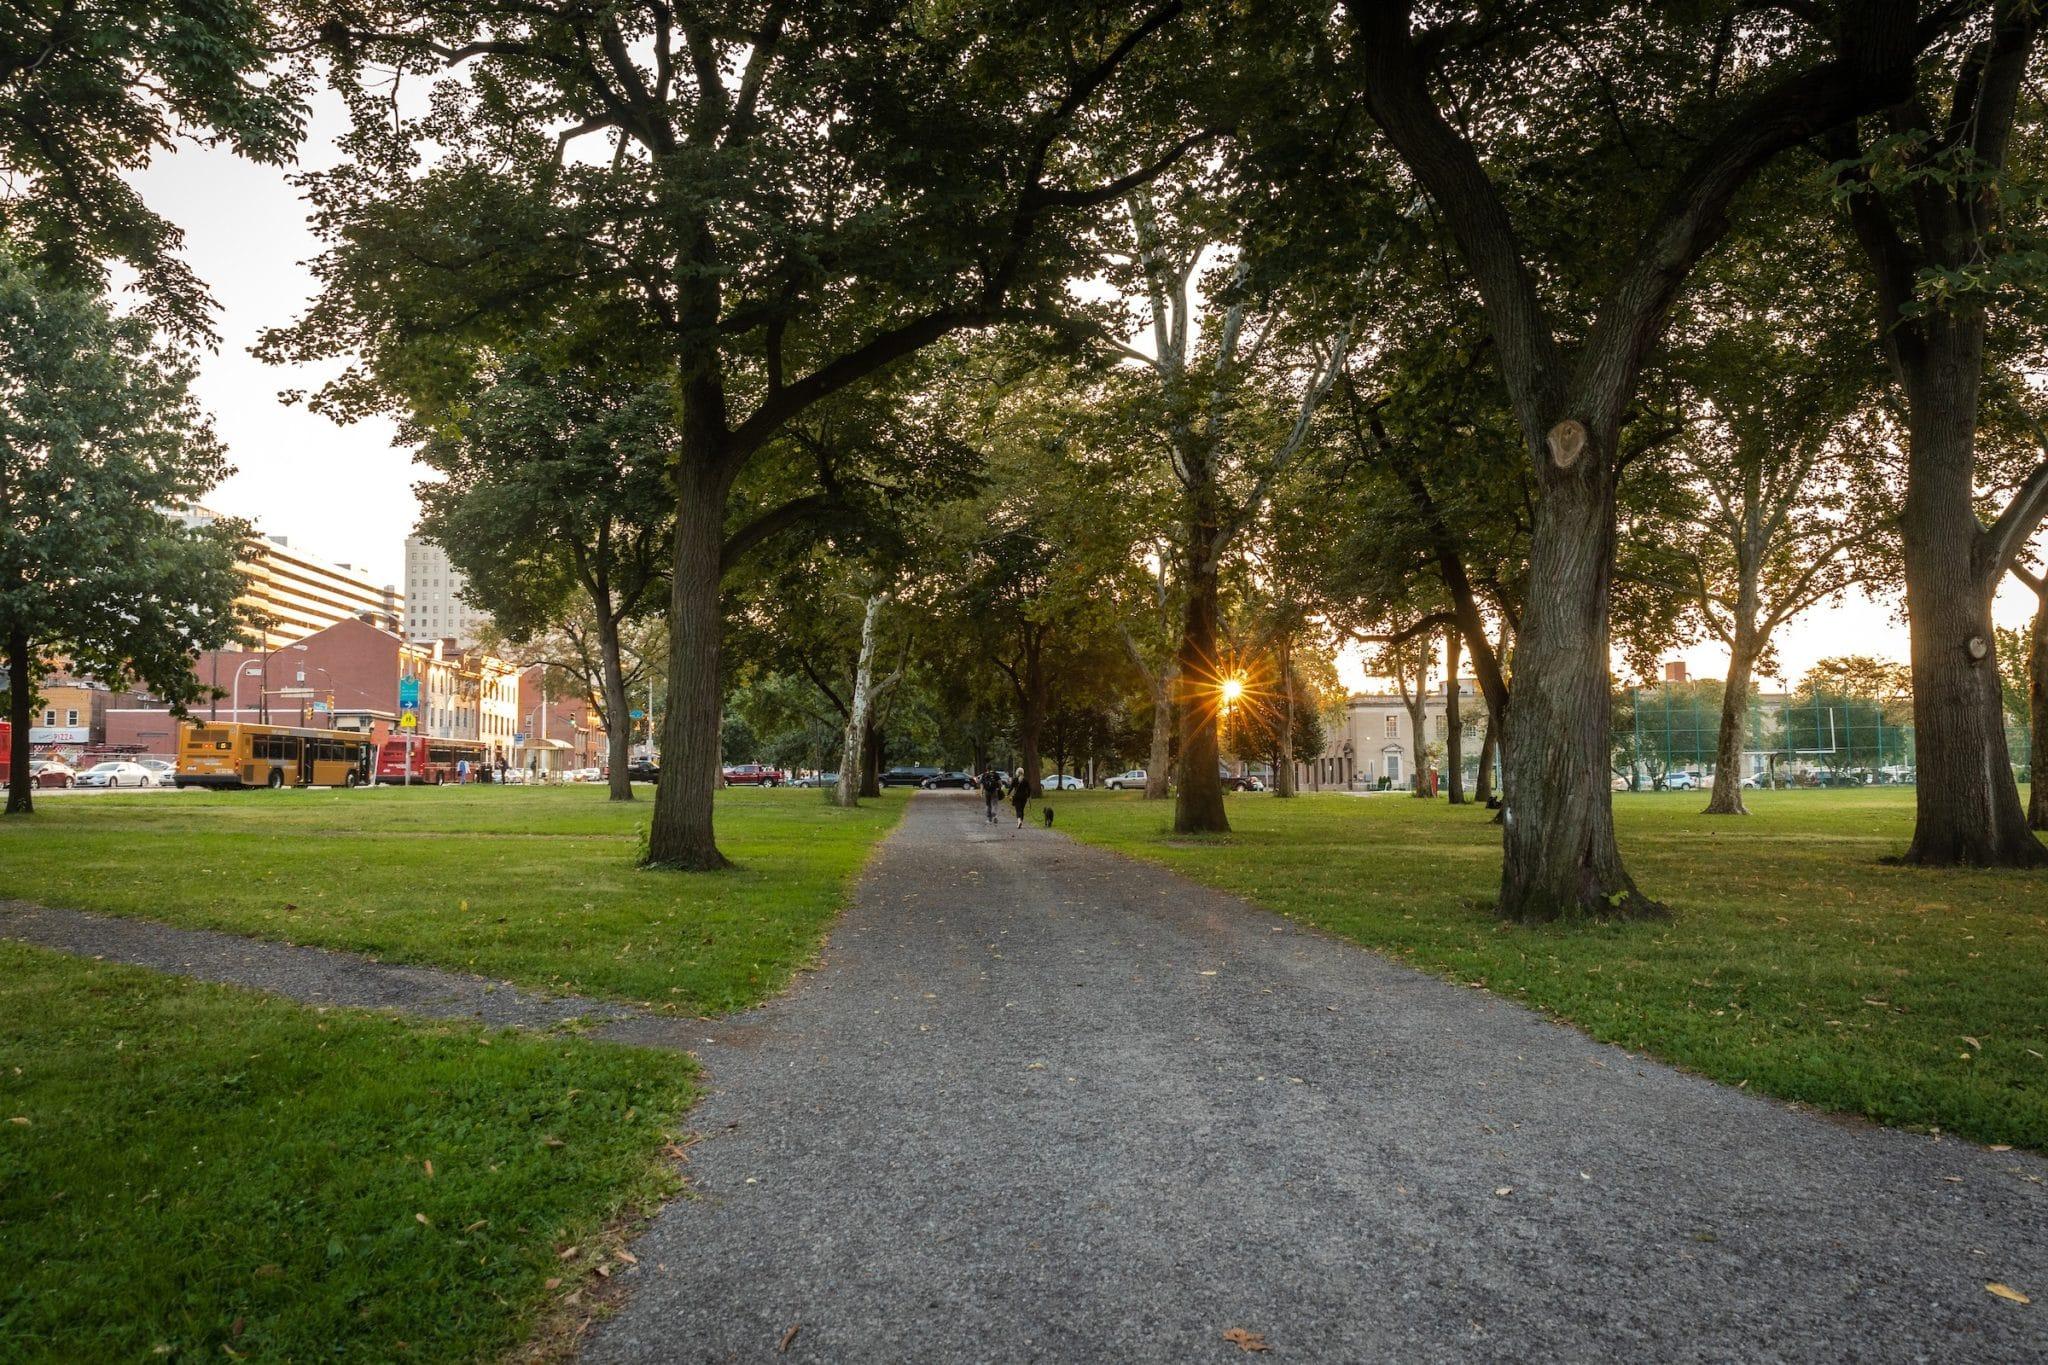 Allegheny Commons Park pathways